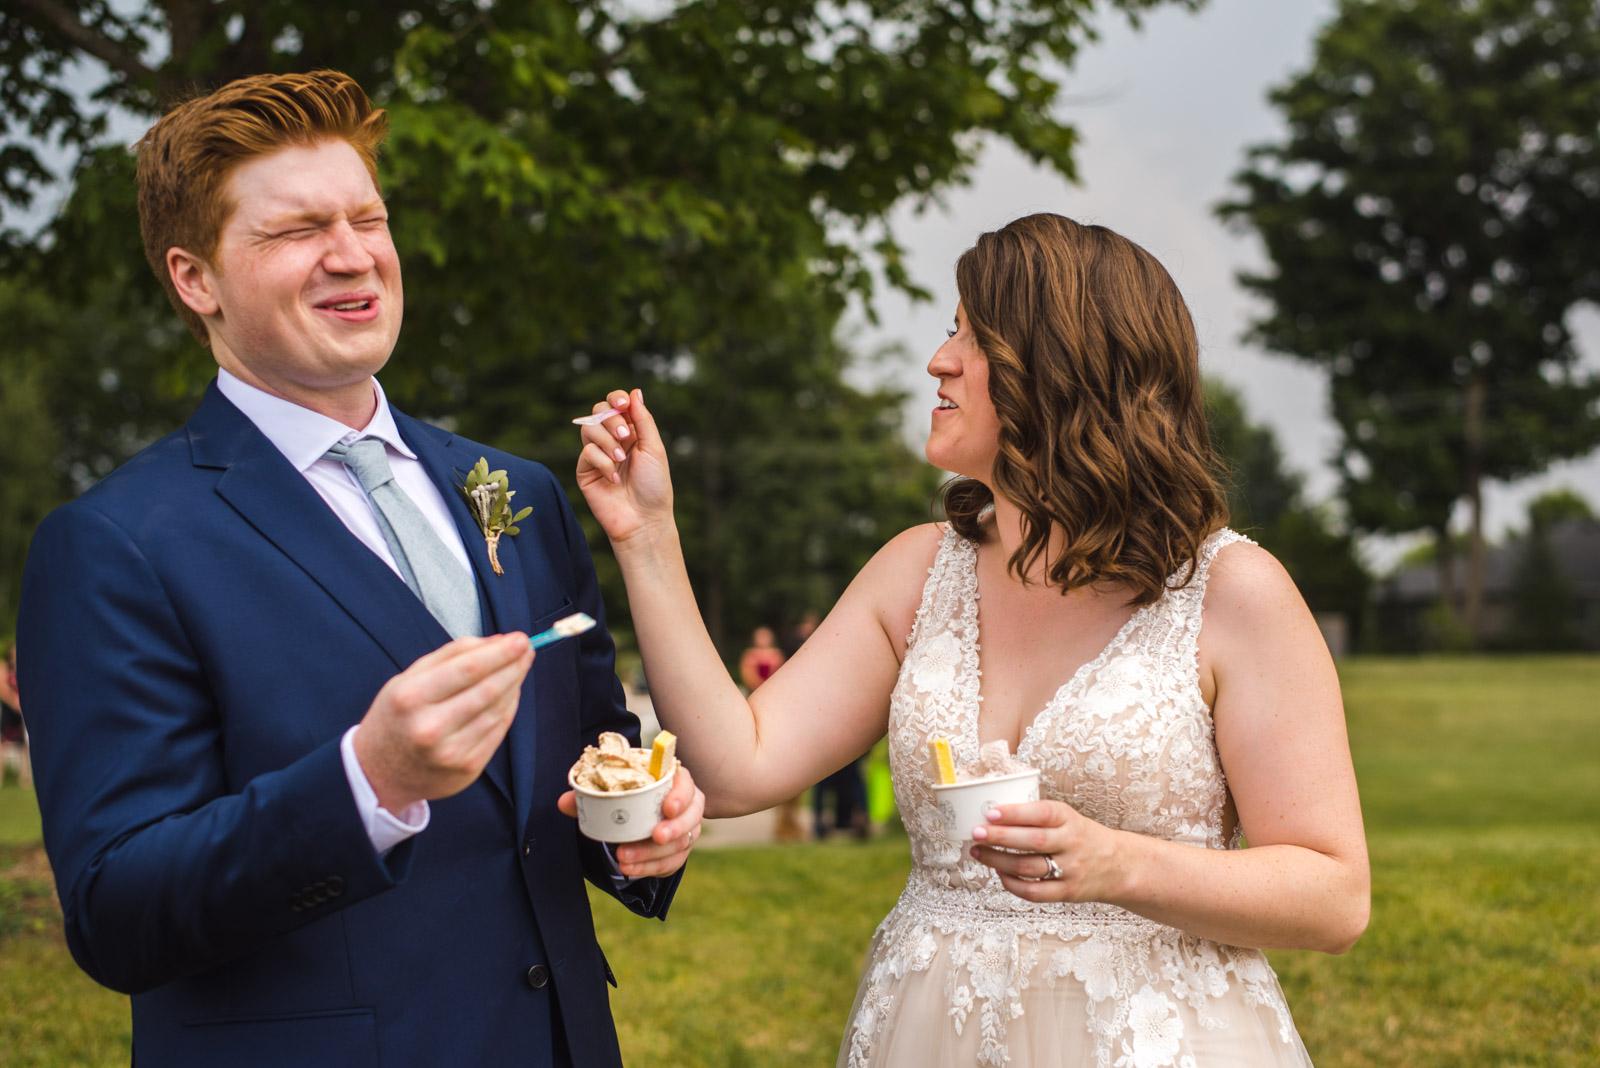 Emerson & Elicia's Golf Course Wedding Aidan & Leanne Hennebry Hamilton Wedding Videographers Photographers Niagara Hush Hush Photography & Film-34.jpg